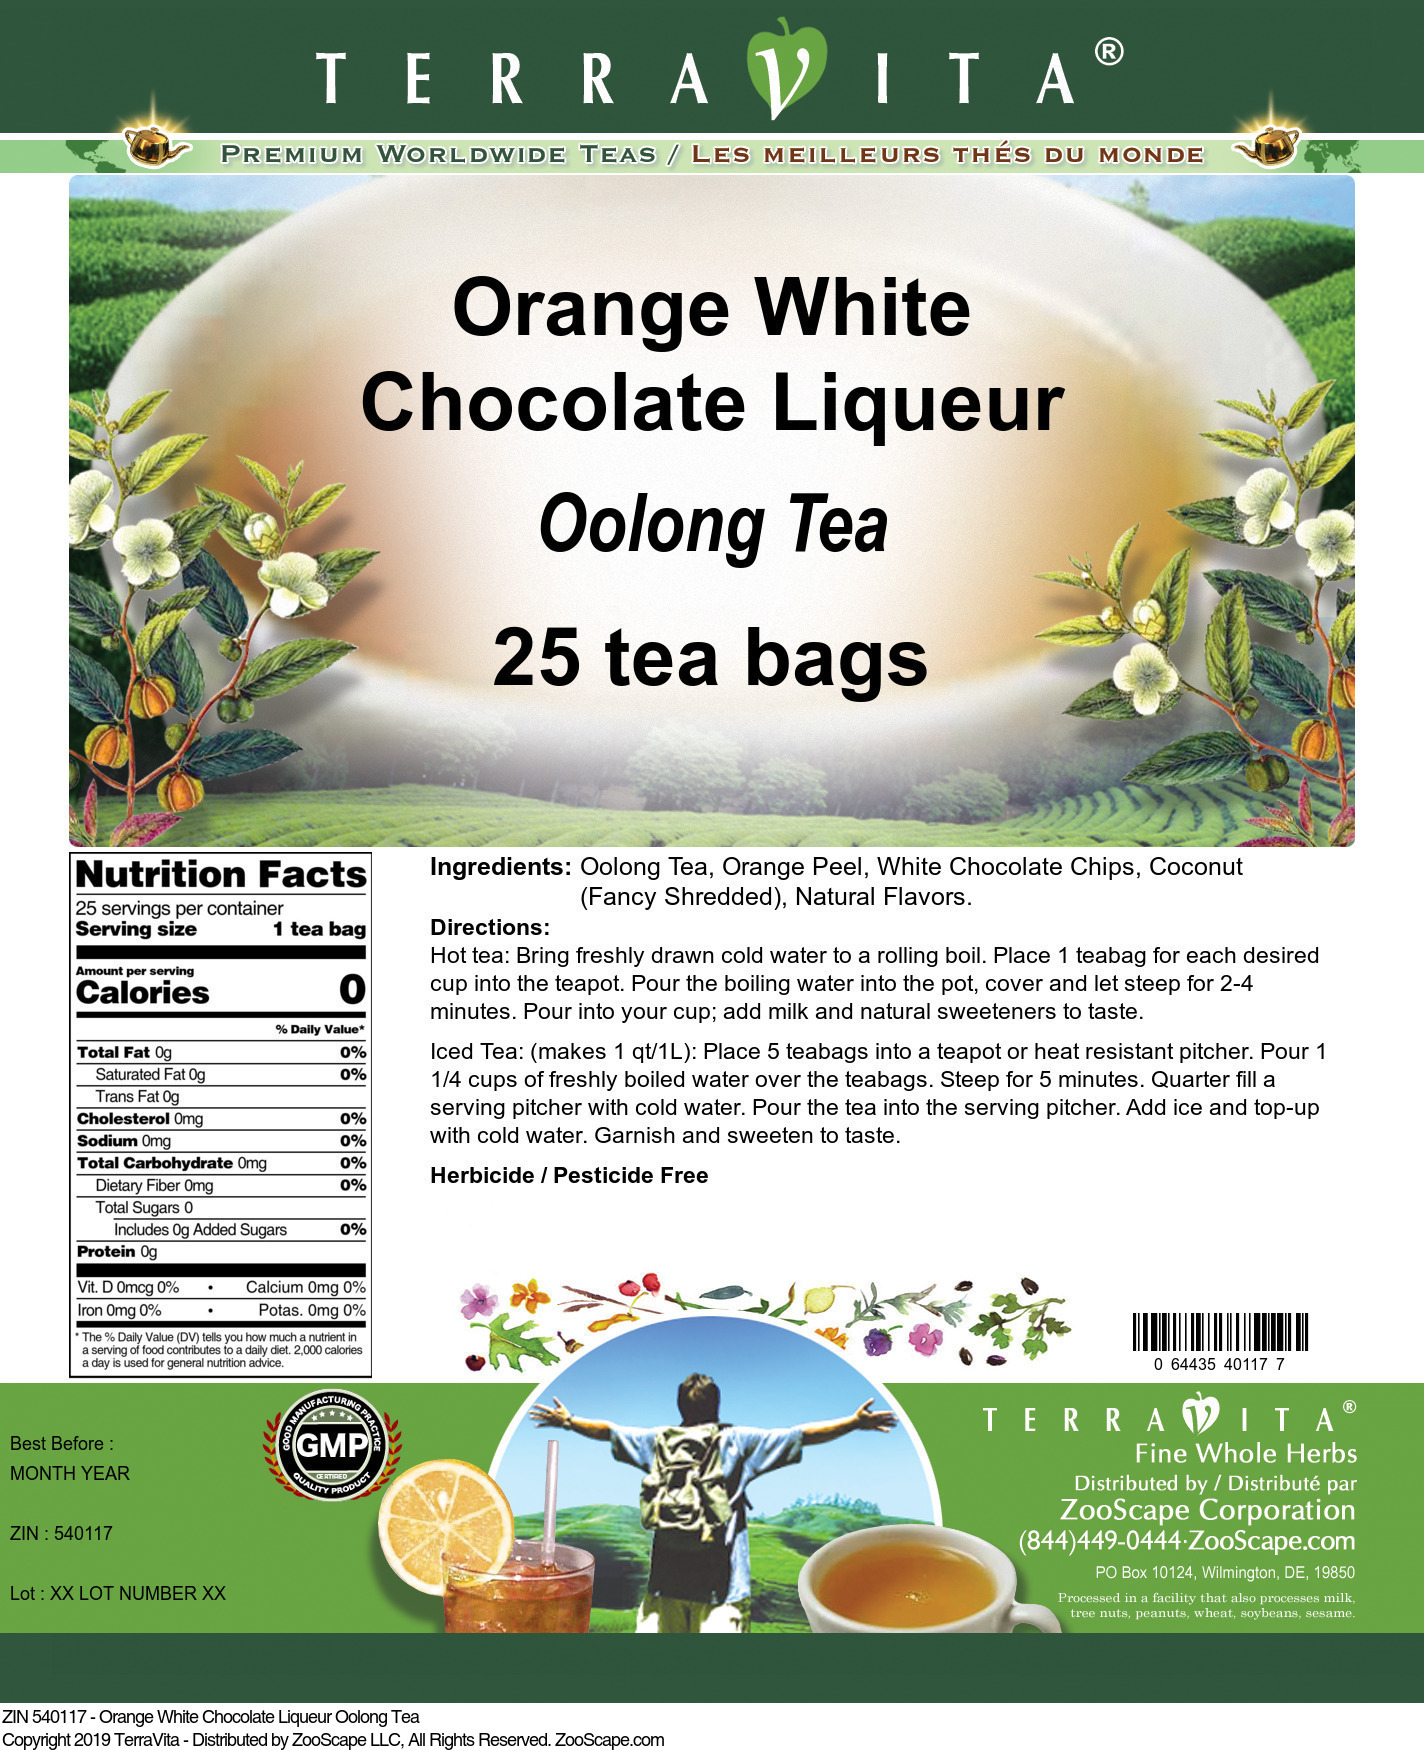 Orange White Chocolate Liqueur Oolong Tea